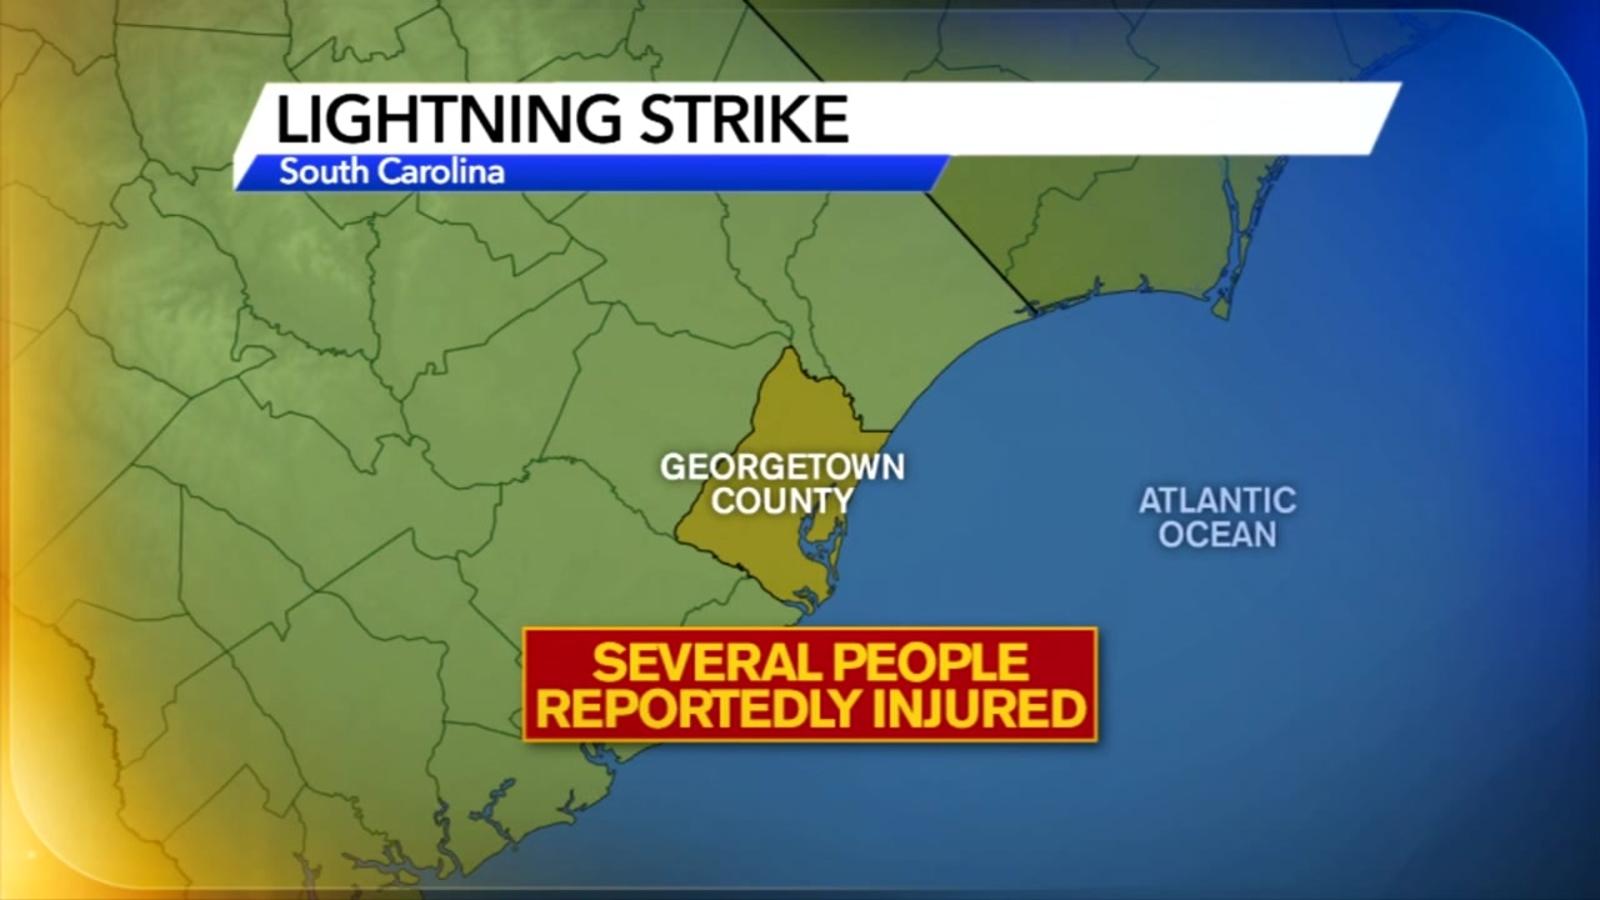 1 dead, as many as 12 injured in lightning strike in SC on July 4